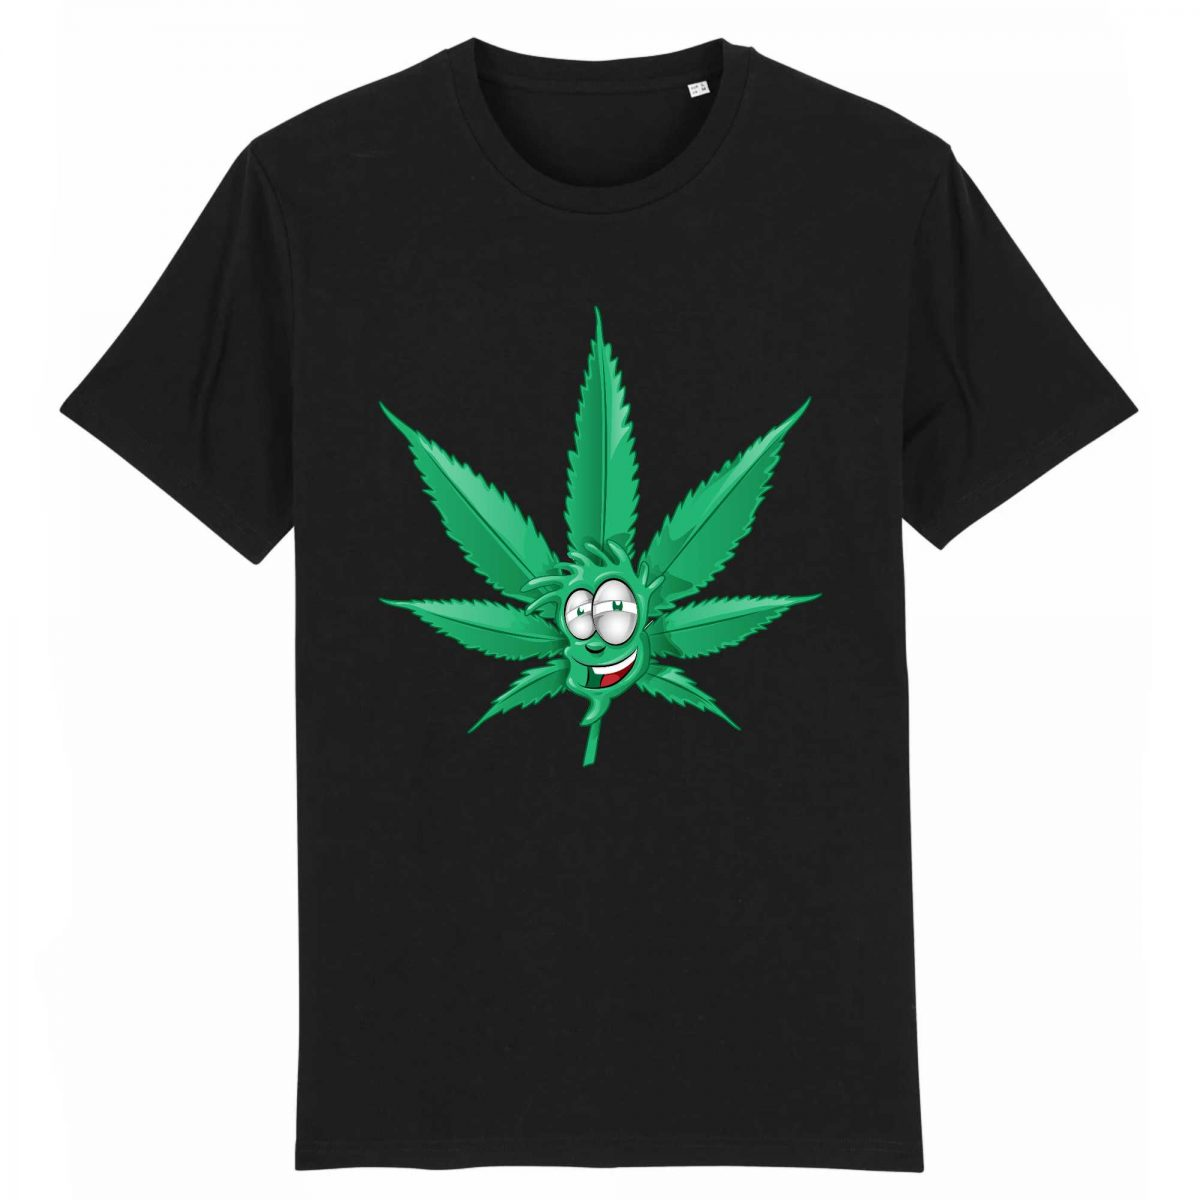 T-shirt Unisexe - Coton BIO Made In Chanvre - Feuille de Cannabis